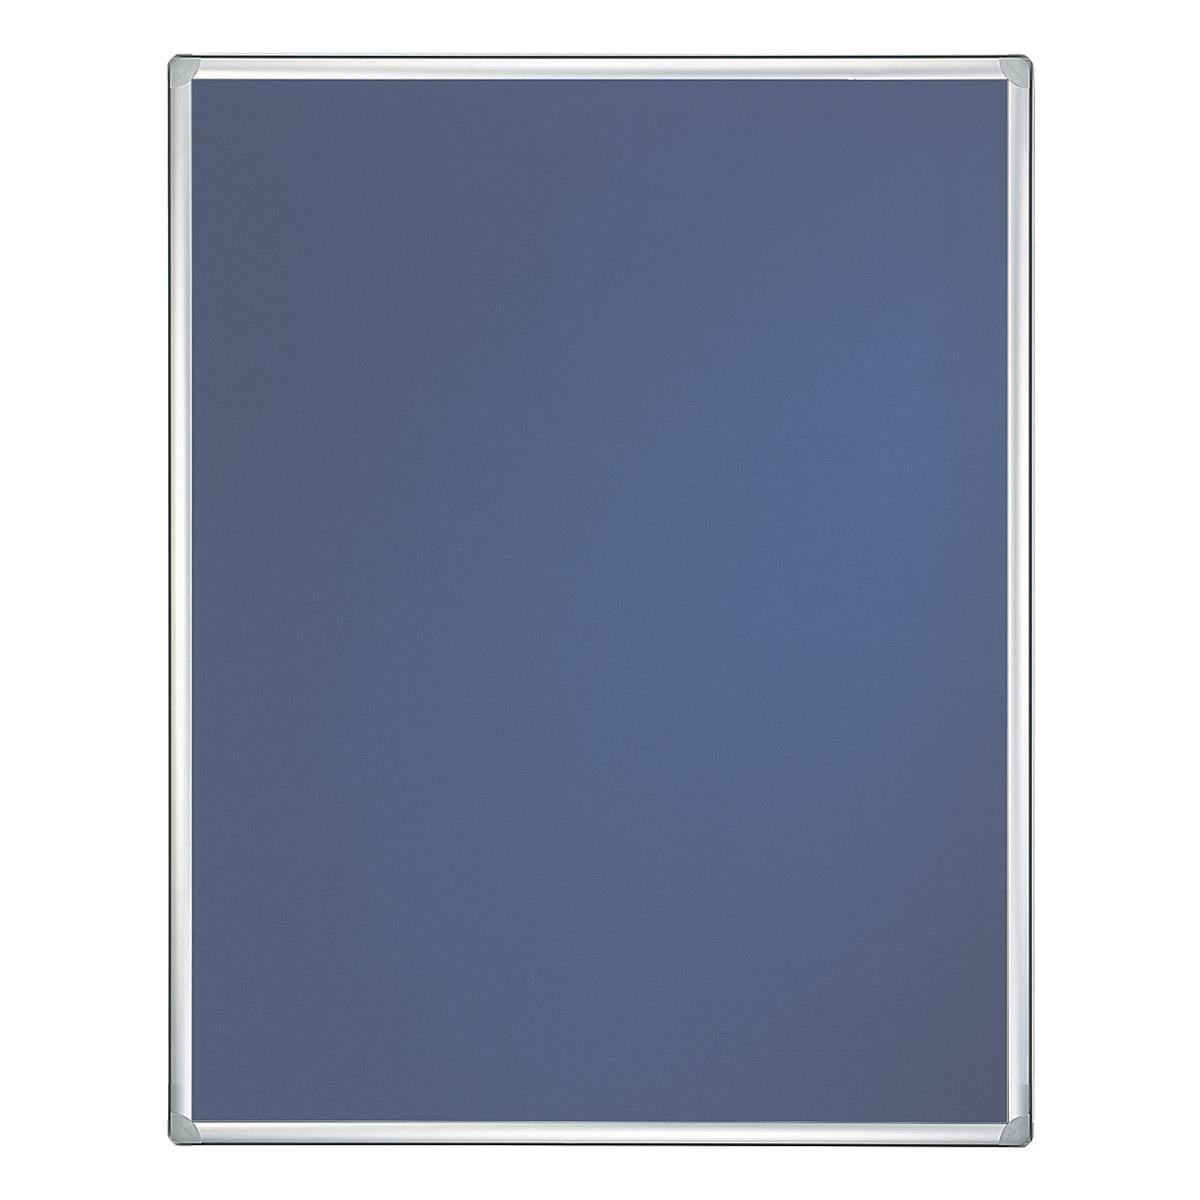 FRANKEN Filz-Pinnwand 180 x 90 cm »PRO PT830703«